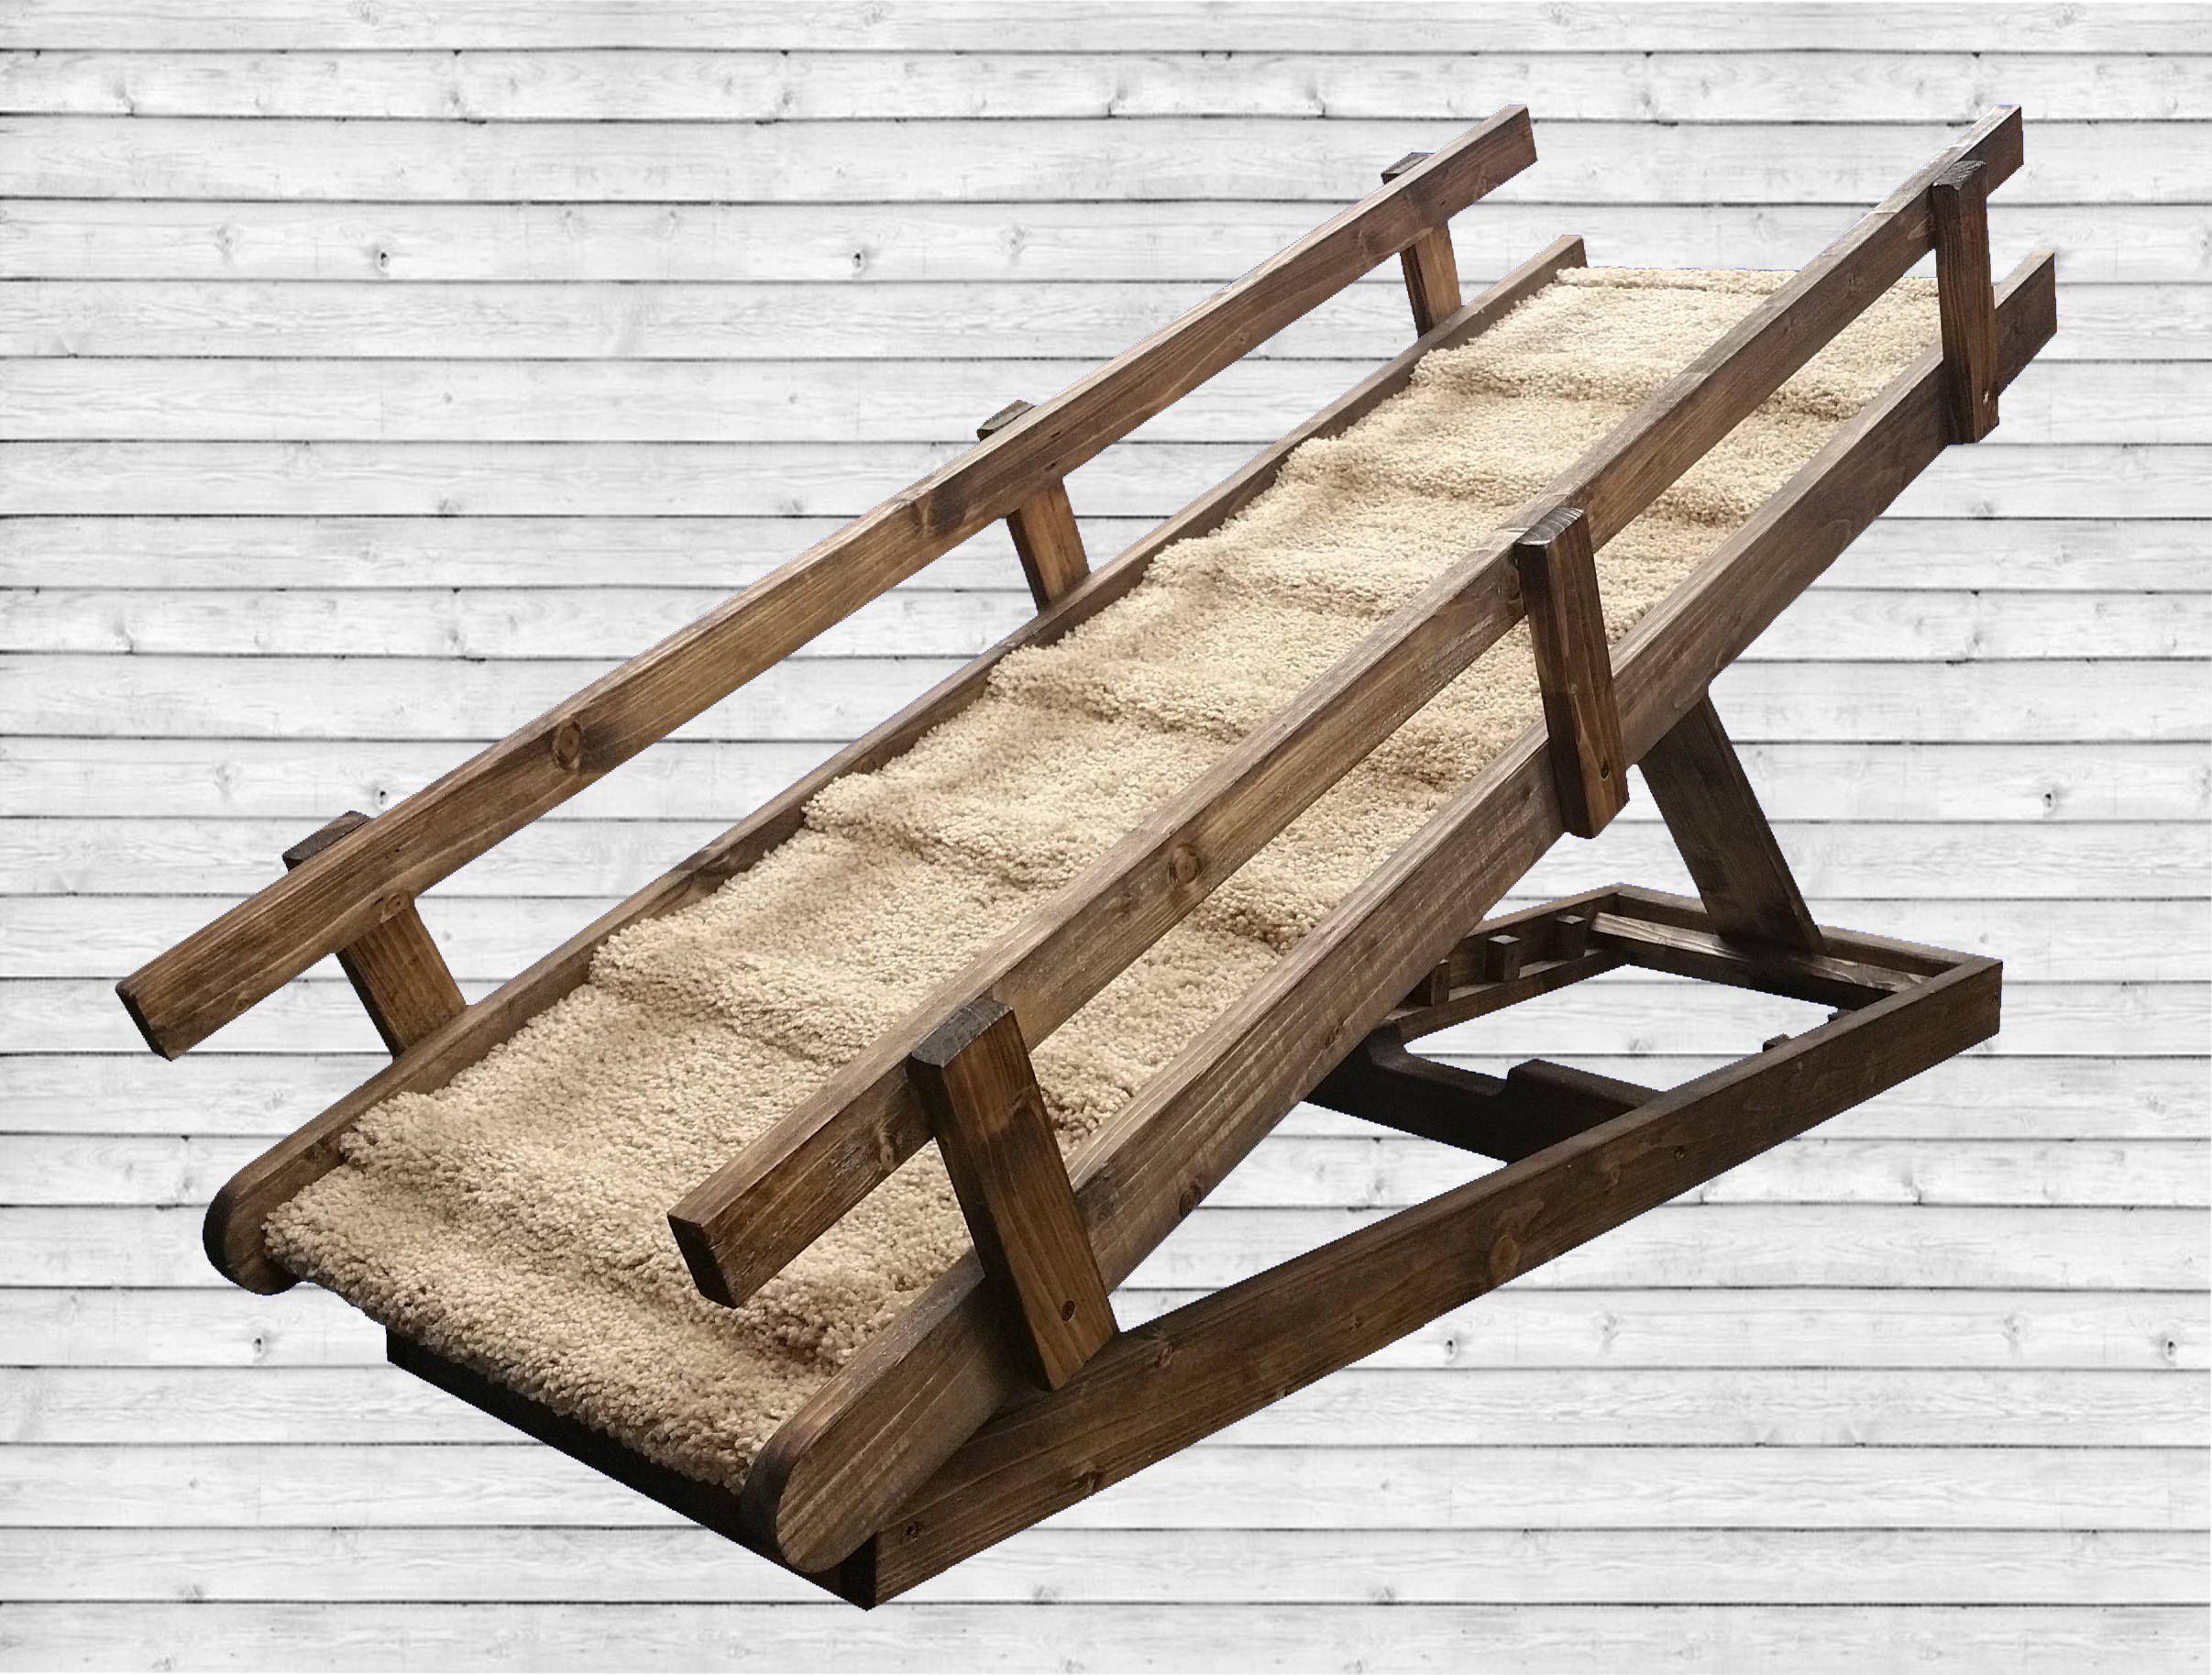 Sturdy Free Standing Dog Ramp W/ Rails/ Built in Steps